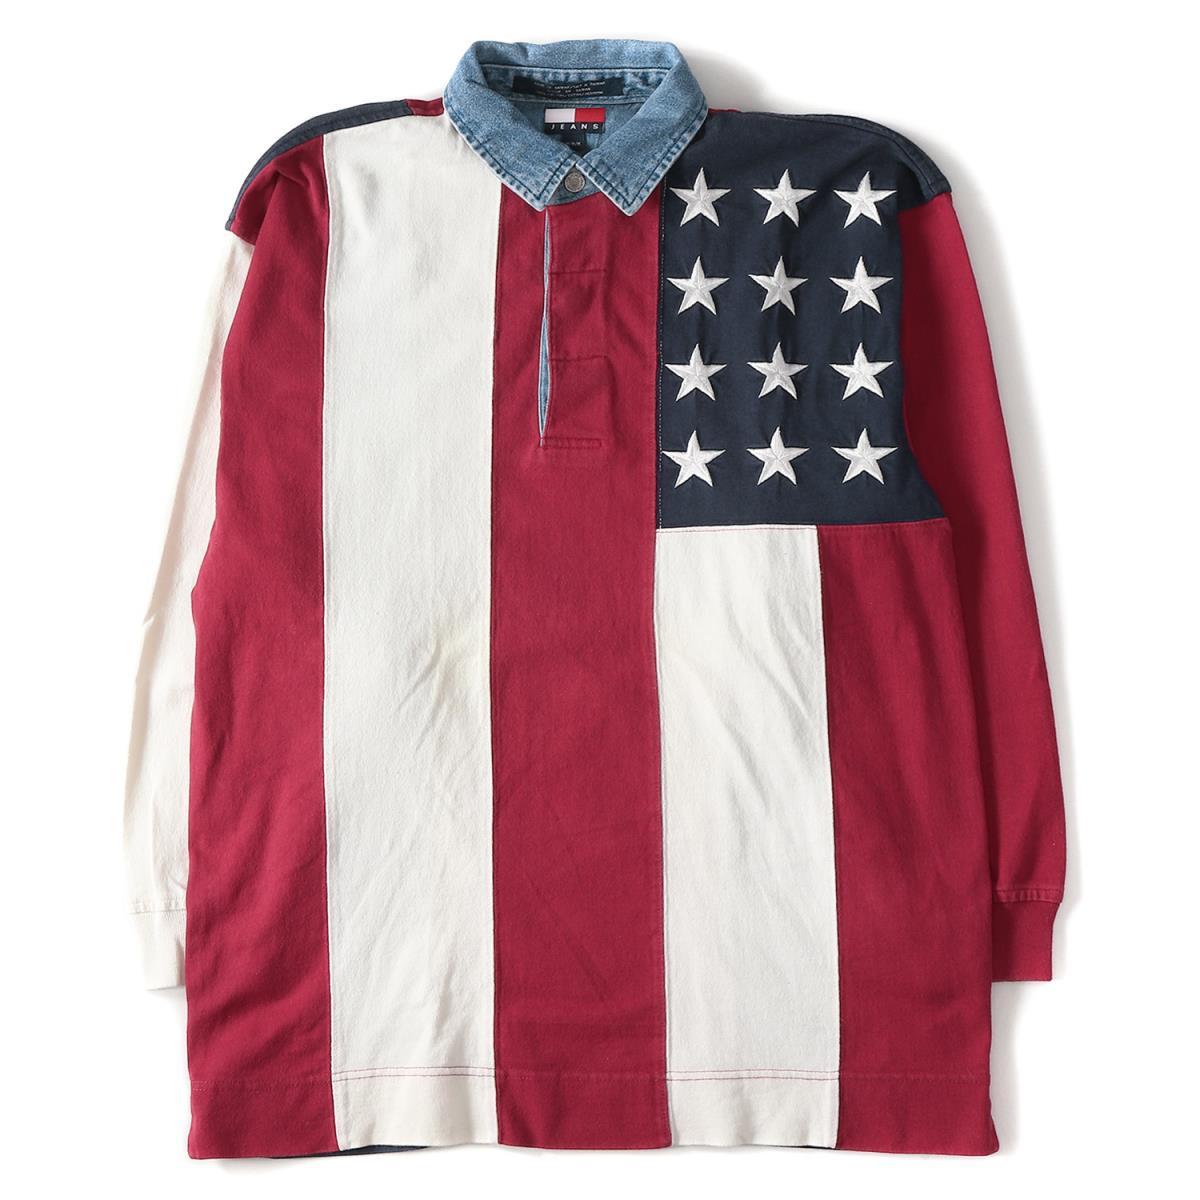 TOMMY HILFIGER (トミーヒルフィガー) 90's 星条旗デザインデニム切替ラガーシャツ ヴィンテージ デカロゴ レッド×ホワイト×ネイビー M 【メンズ】【K2167】【中古】【あす楽☆対応可】